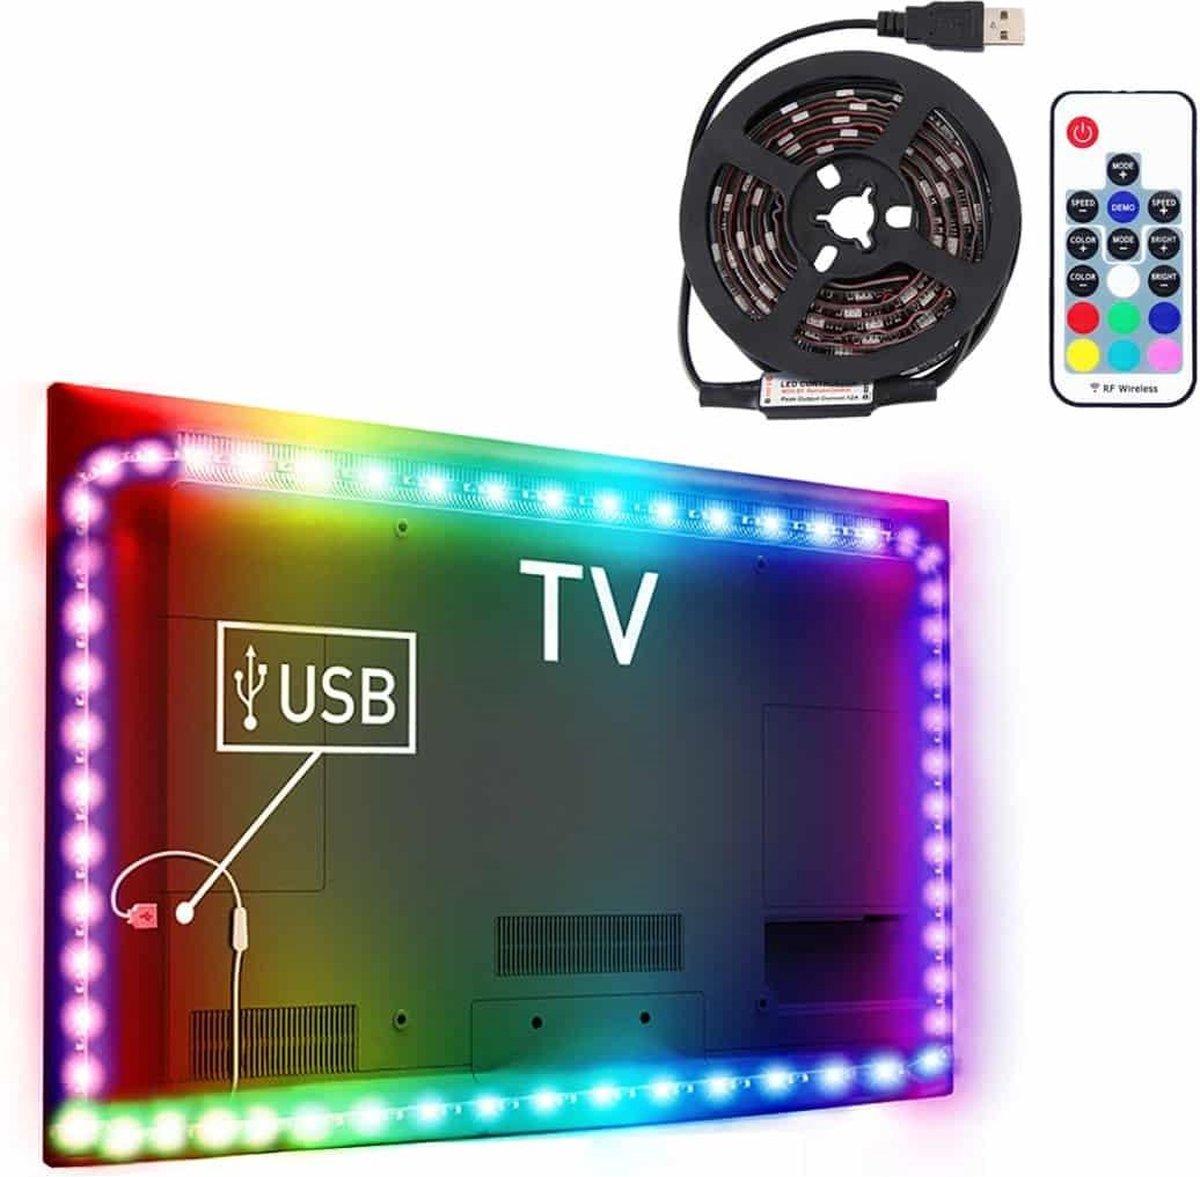 1m USB-tv Blackboard RGB Epoxy Rope Light, 12W 60 LED's SMD 5050 met 17-toetsen RF draadloze afstandsbediening, DC 5V